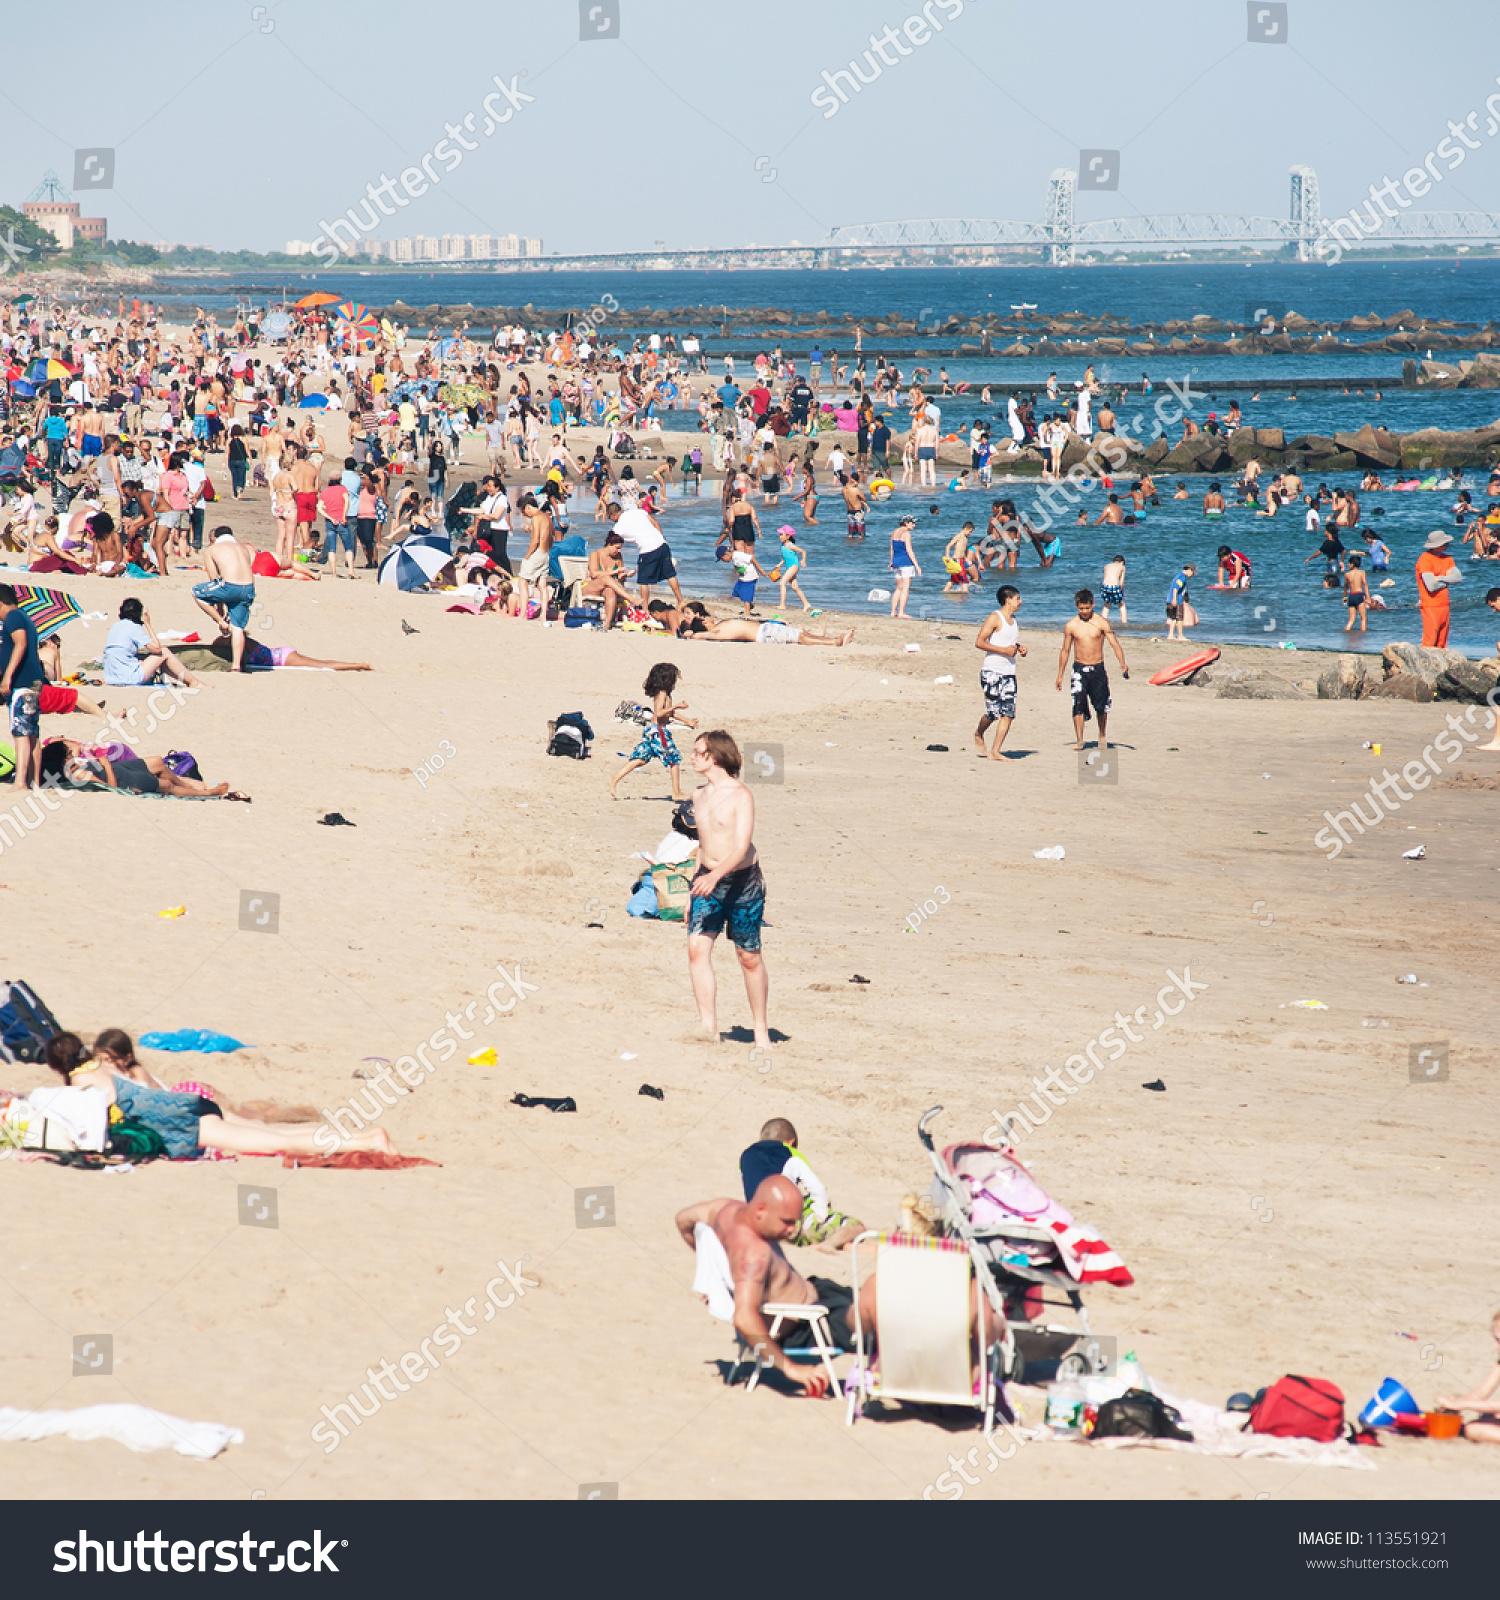 Coney Island Beach: June 27: People On The Beach On June 27, 2012